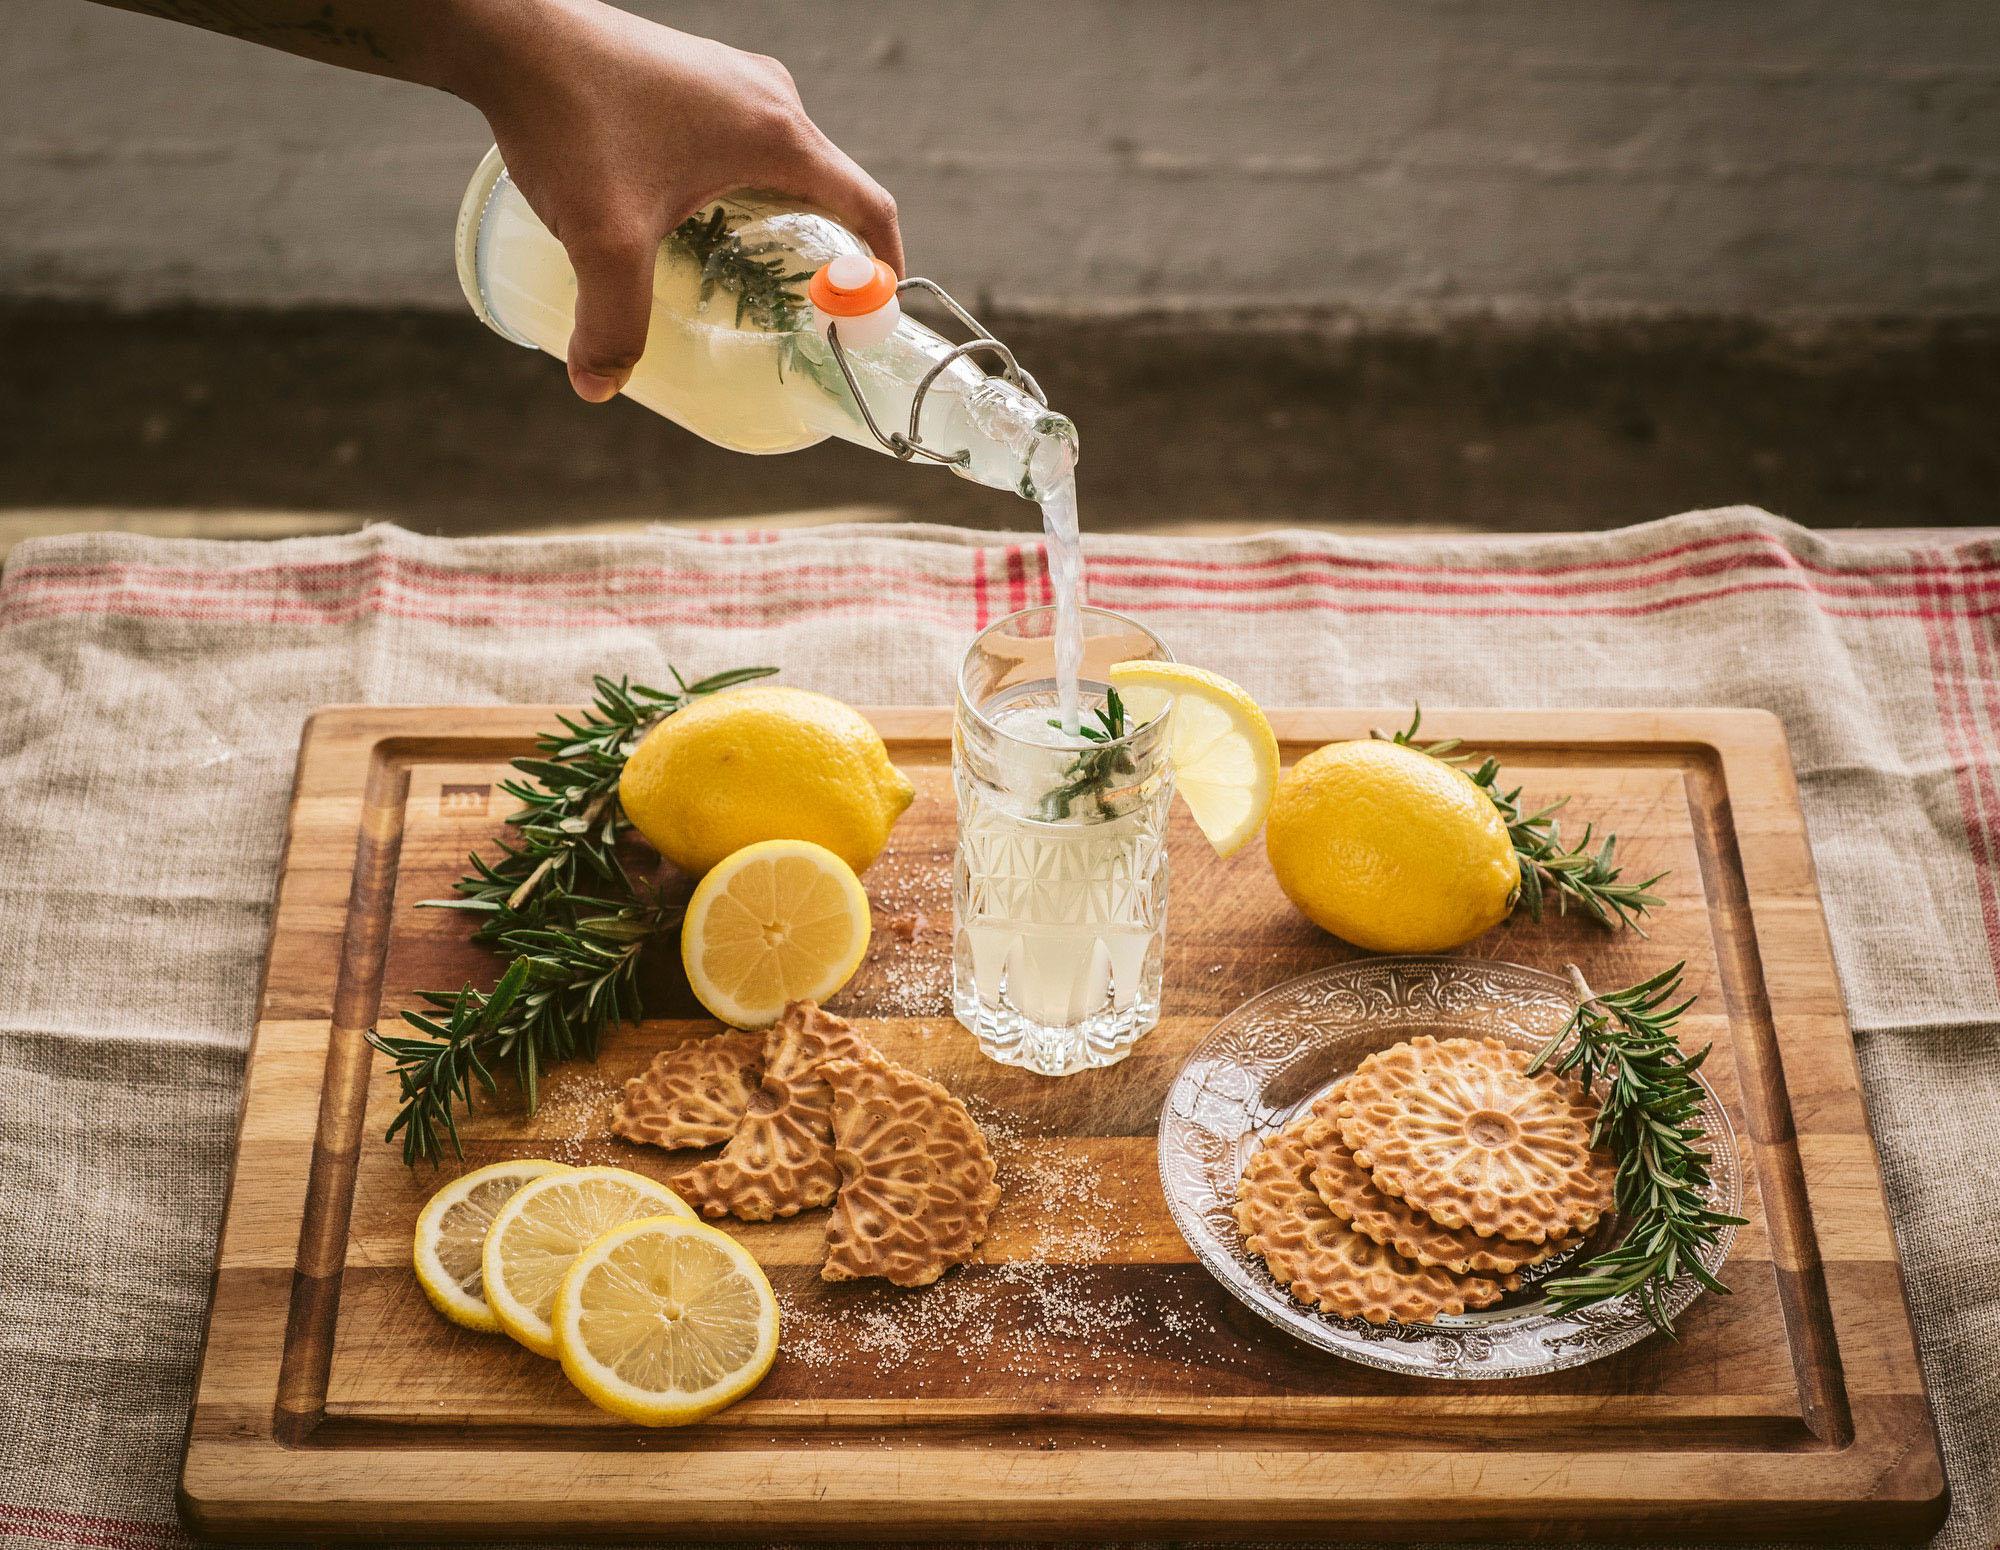 Sparkling Rosemary Lemonade Pour